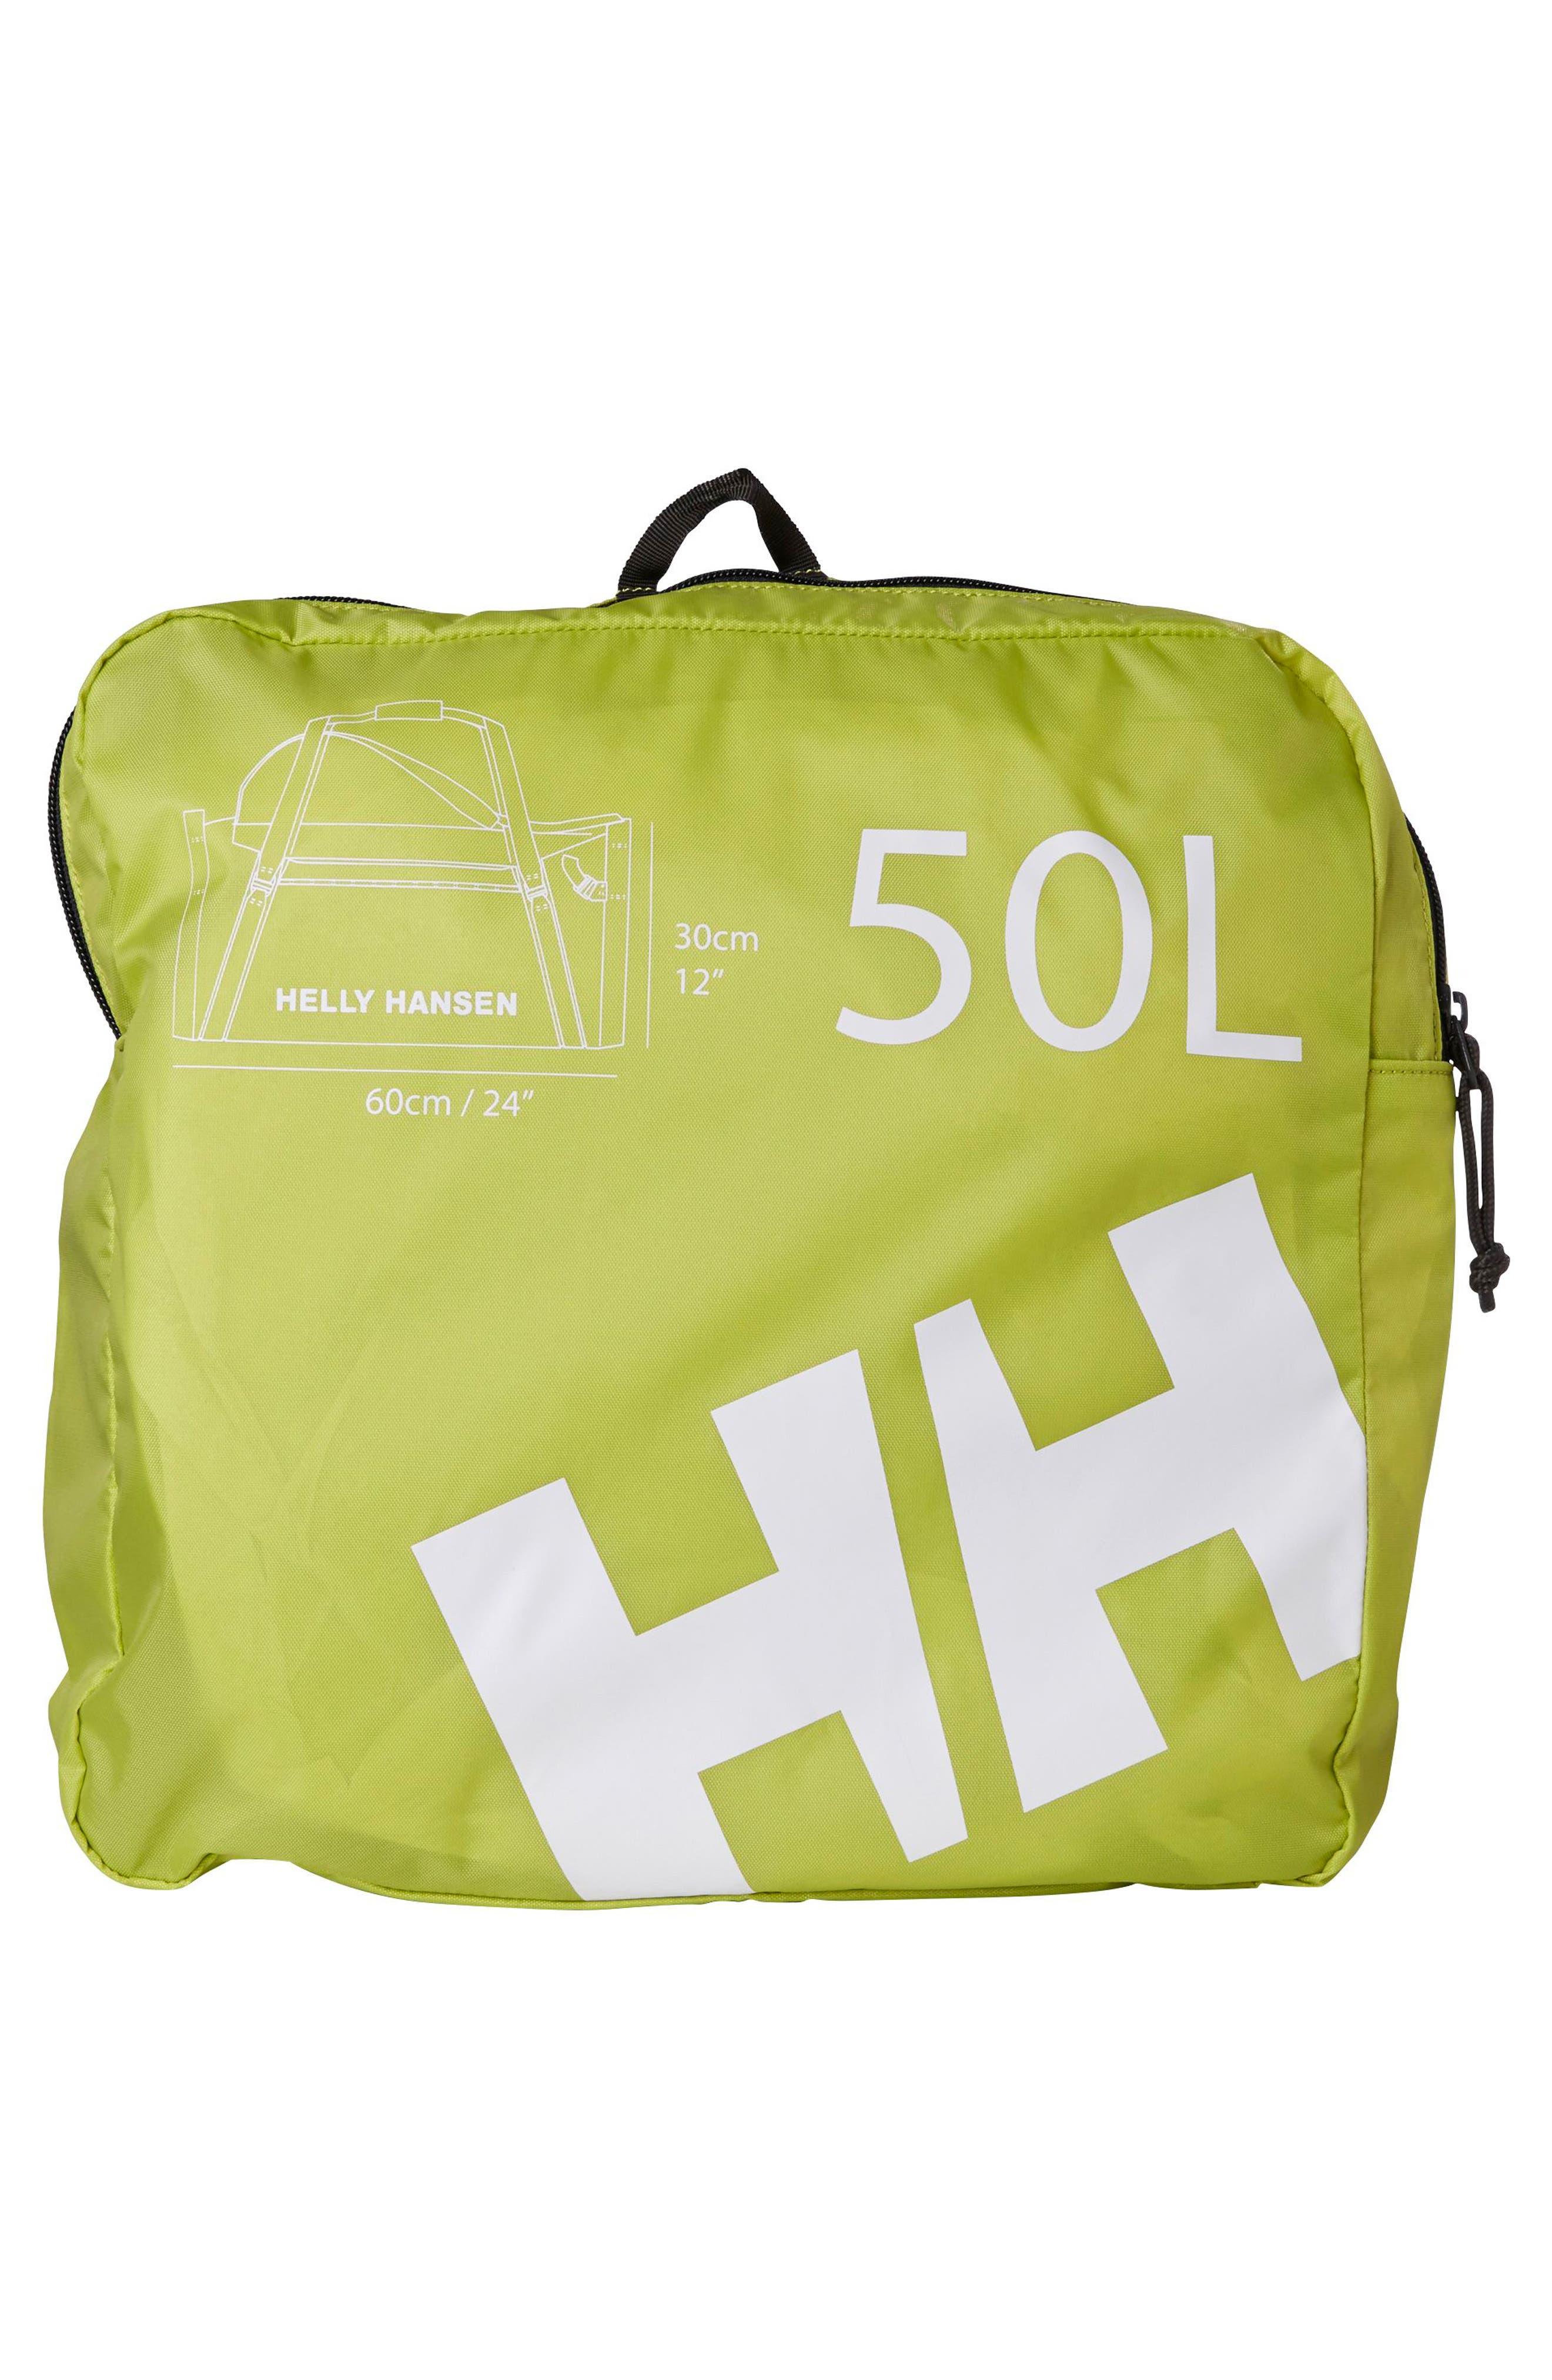 50-Liter Duffel Bag,                             Alternate thumbnail 2, color,                             Black